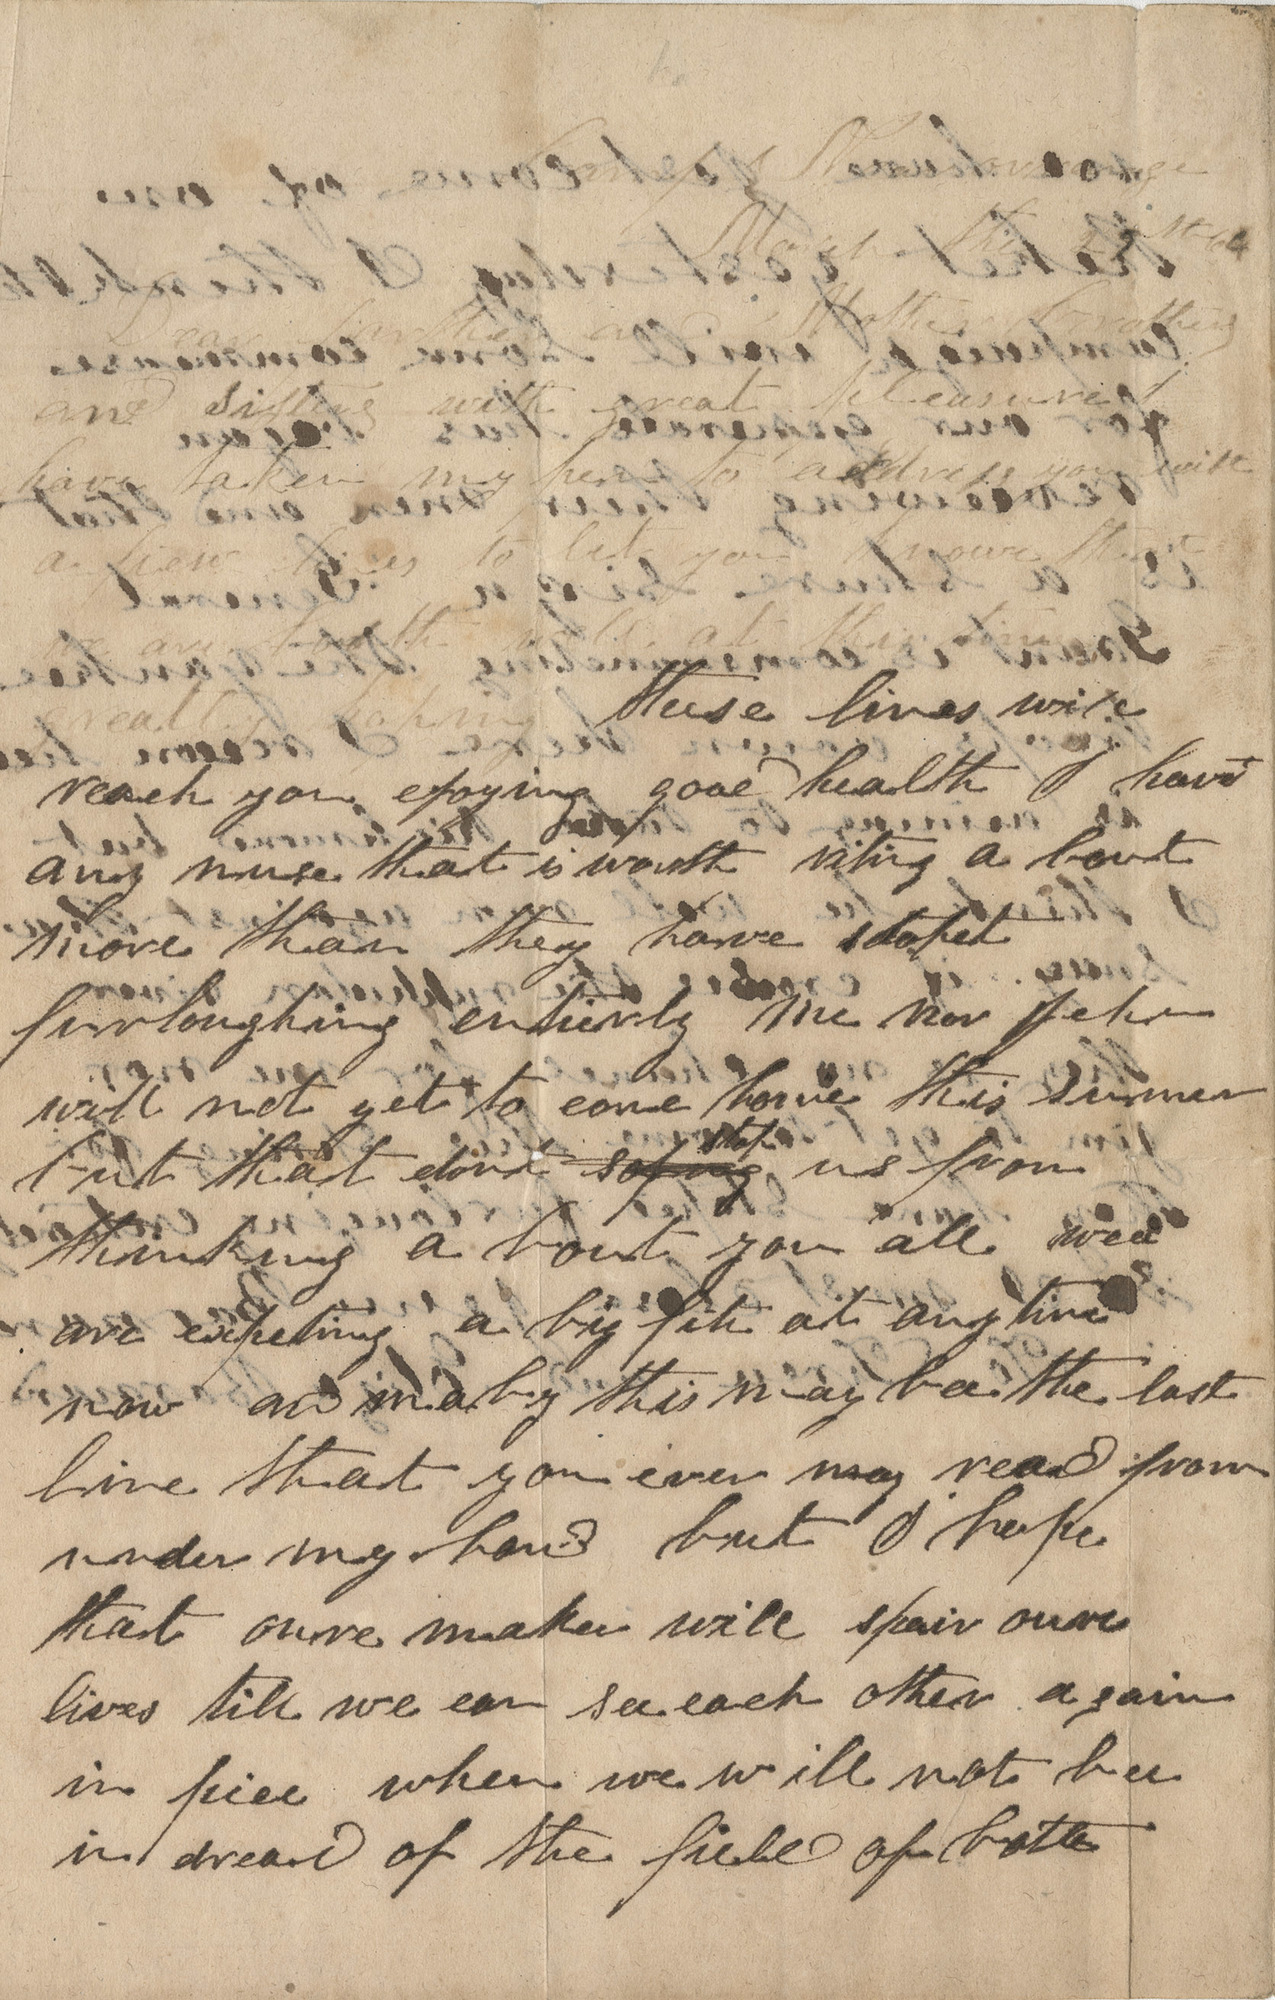 Ms2018_018_BarnardJamesandJehu_Letter_1864_0324a.jpg